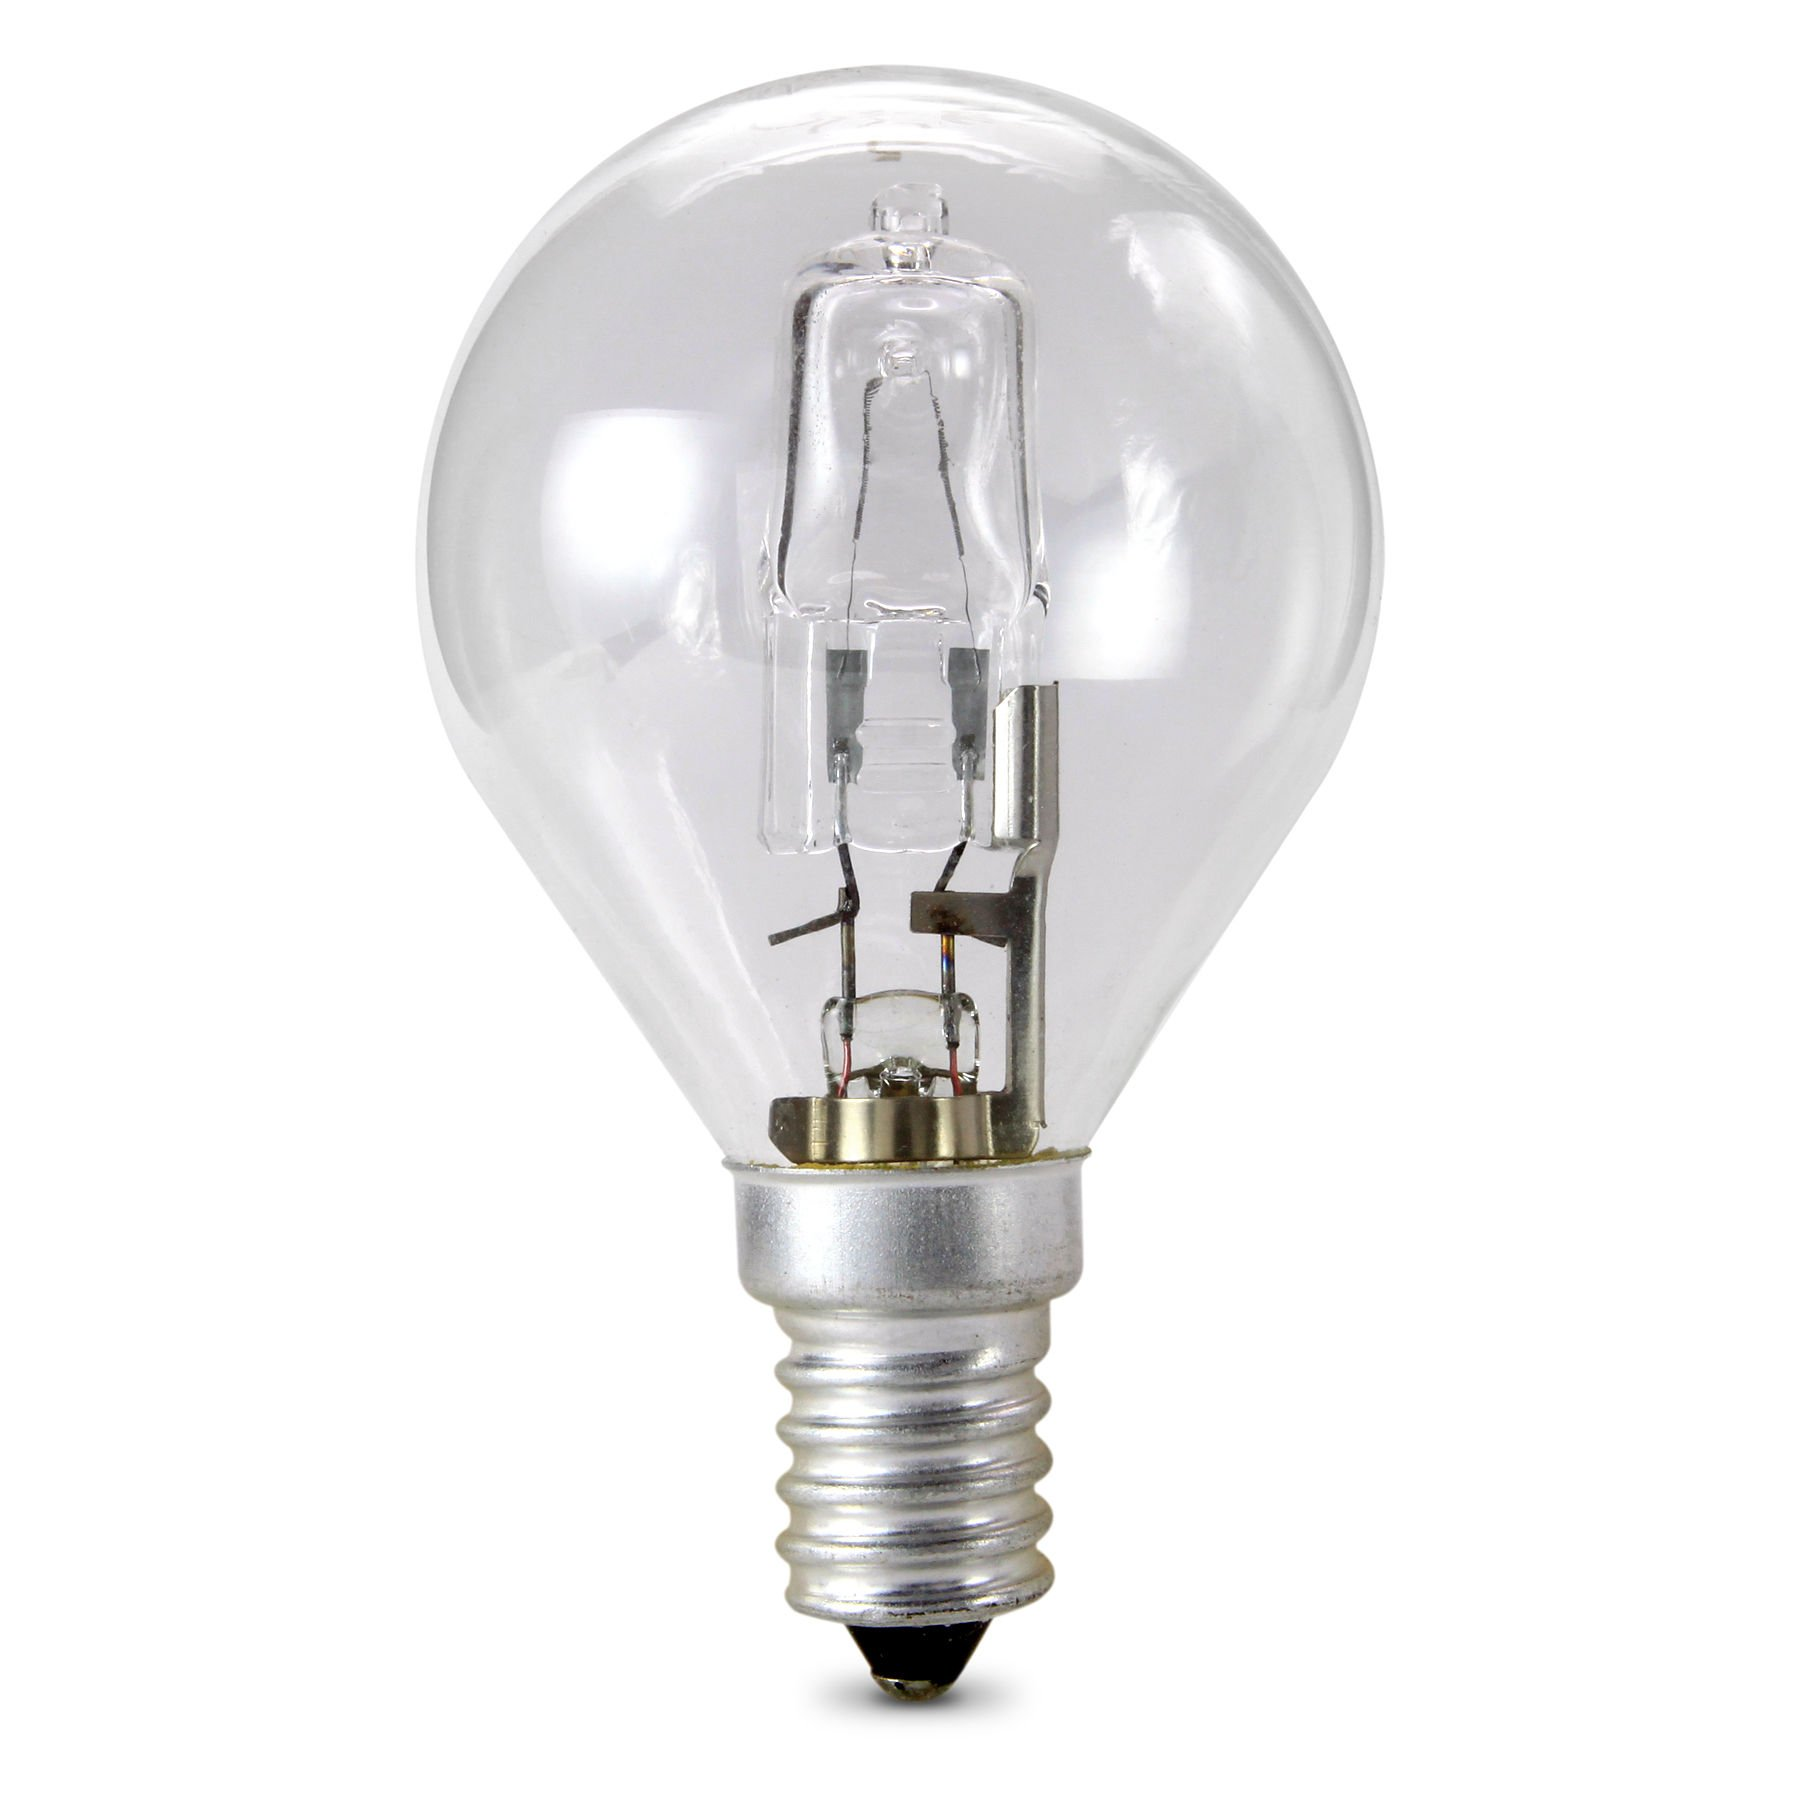 5 x Opus 42w = 60w GLS BC B22 Bayonet Cap Long Life Clear Eco Halogen Light Bulb